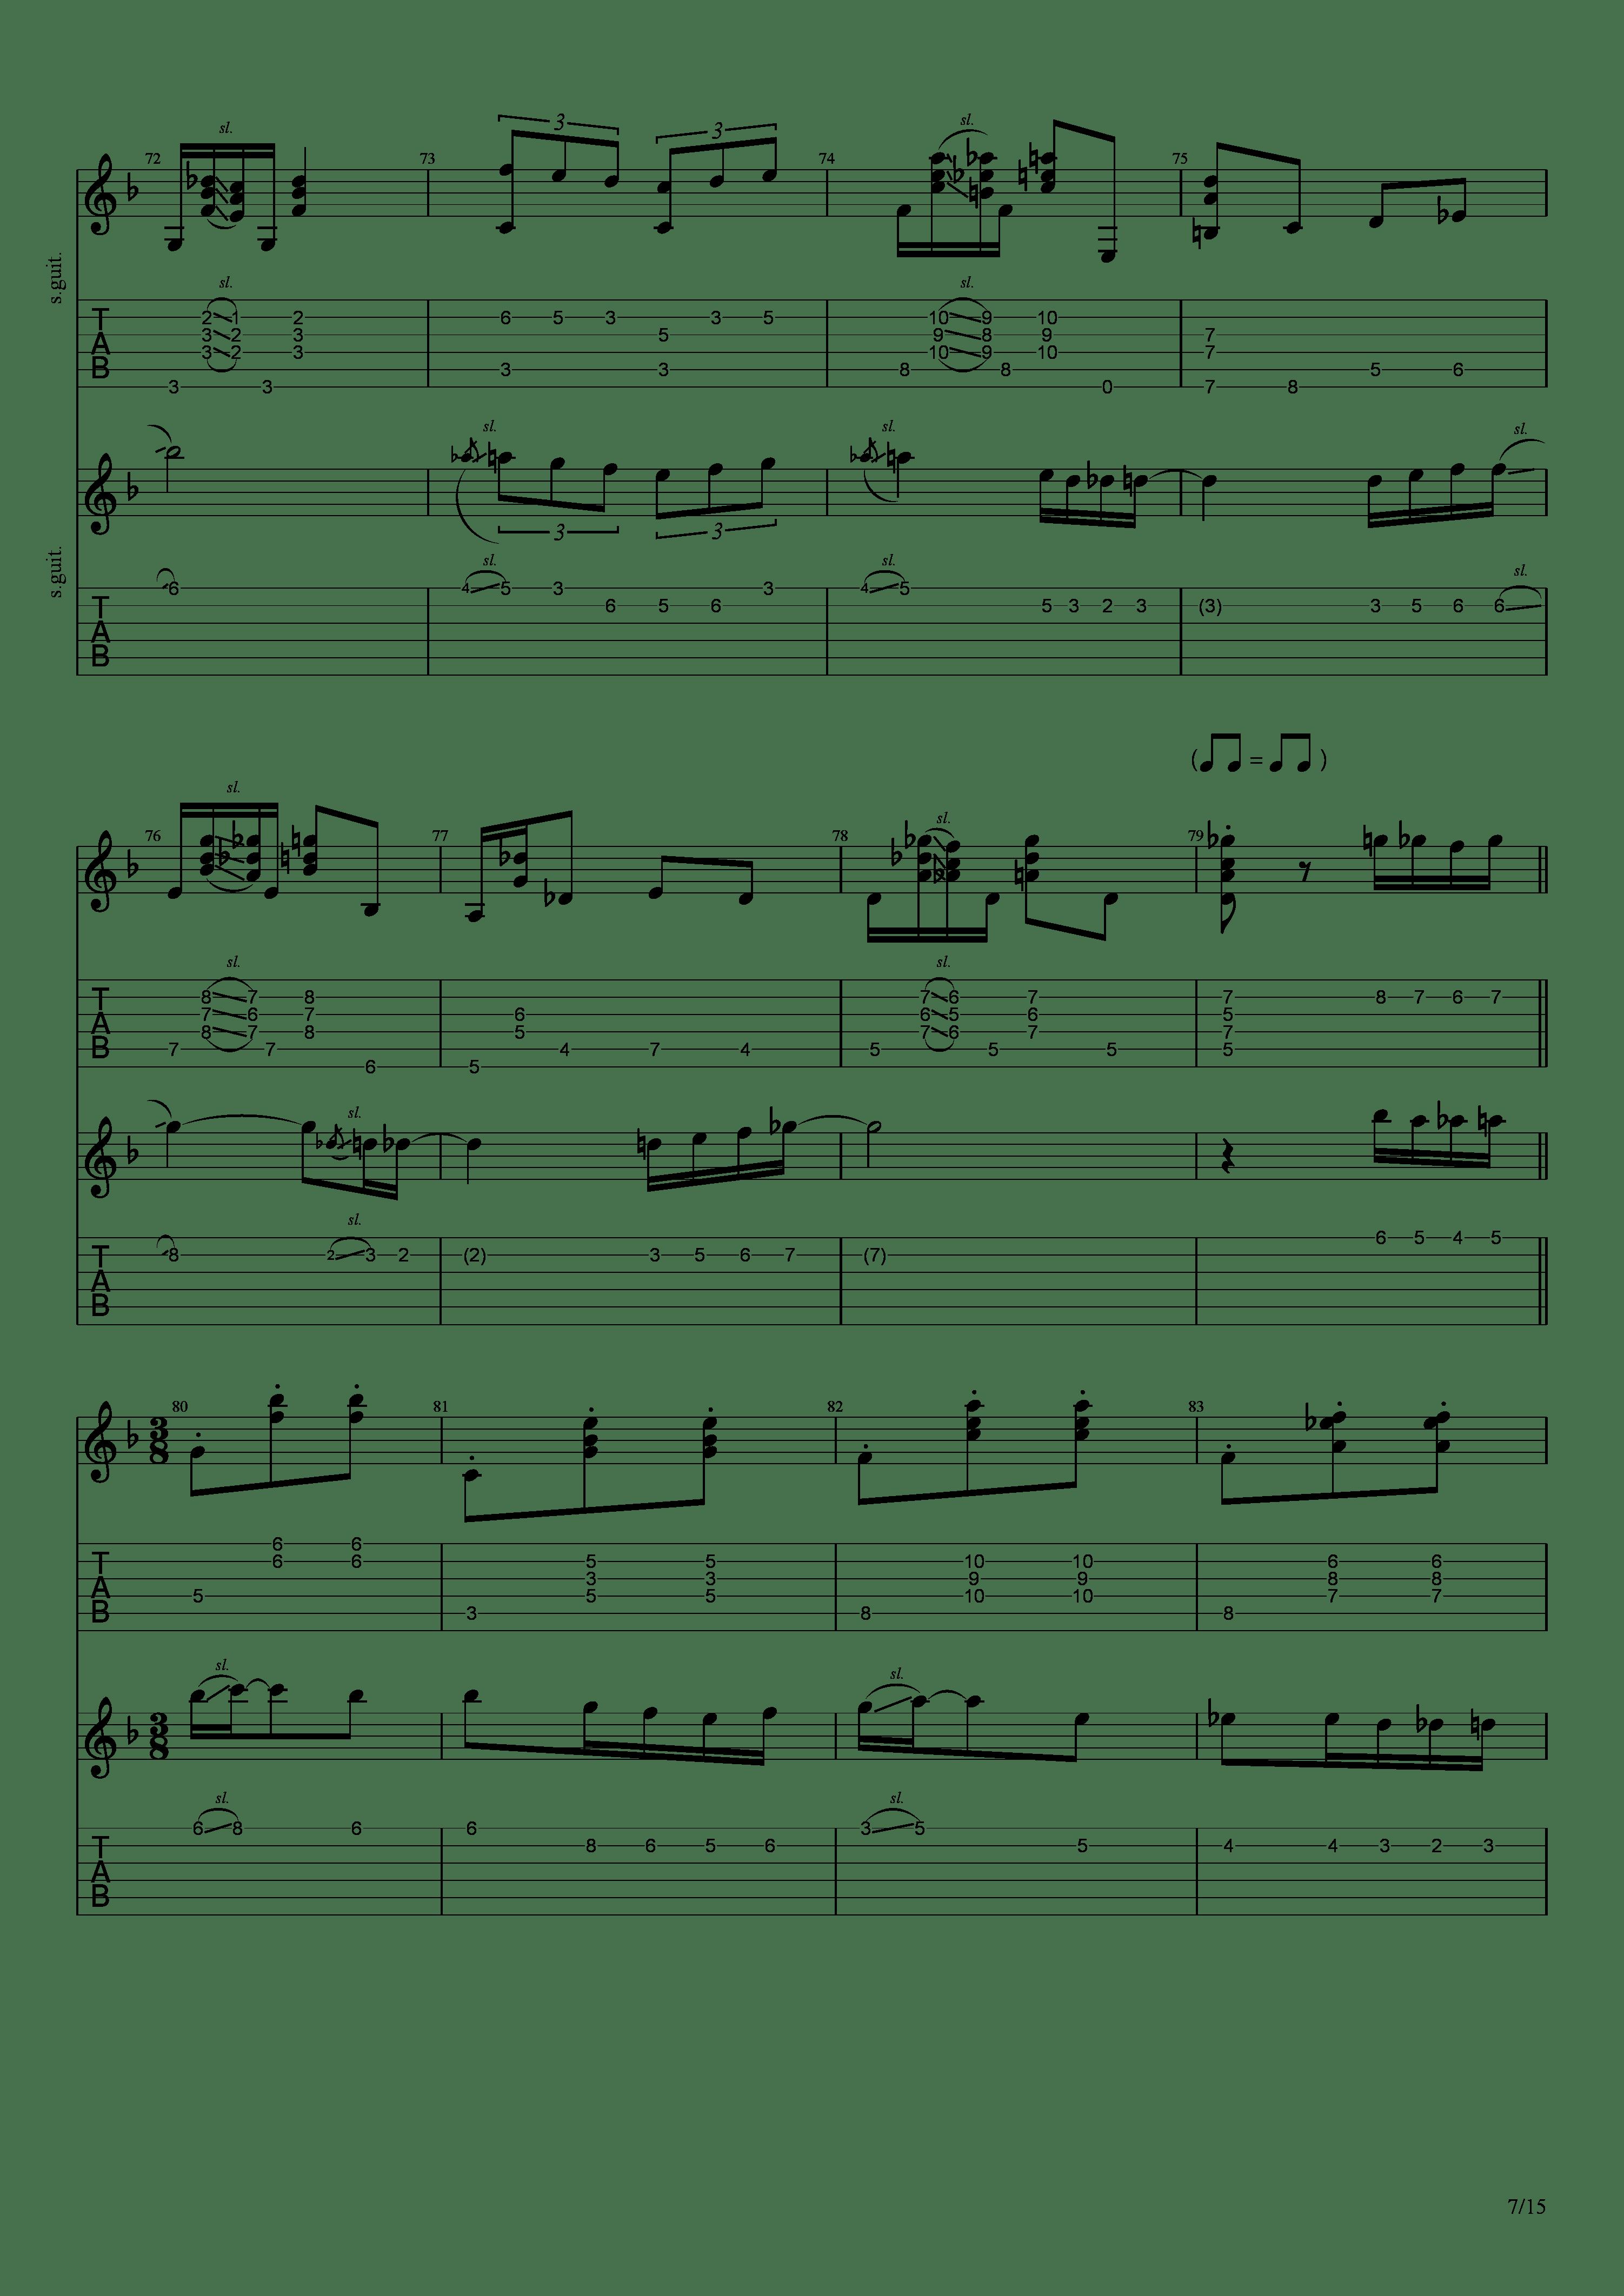 Labyrinth (松井佑贵&井草圣二)吉他谱7